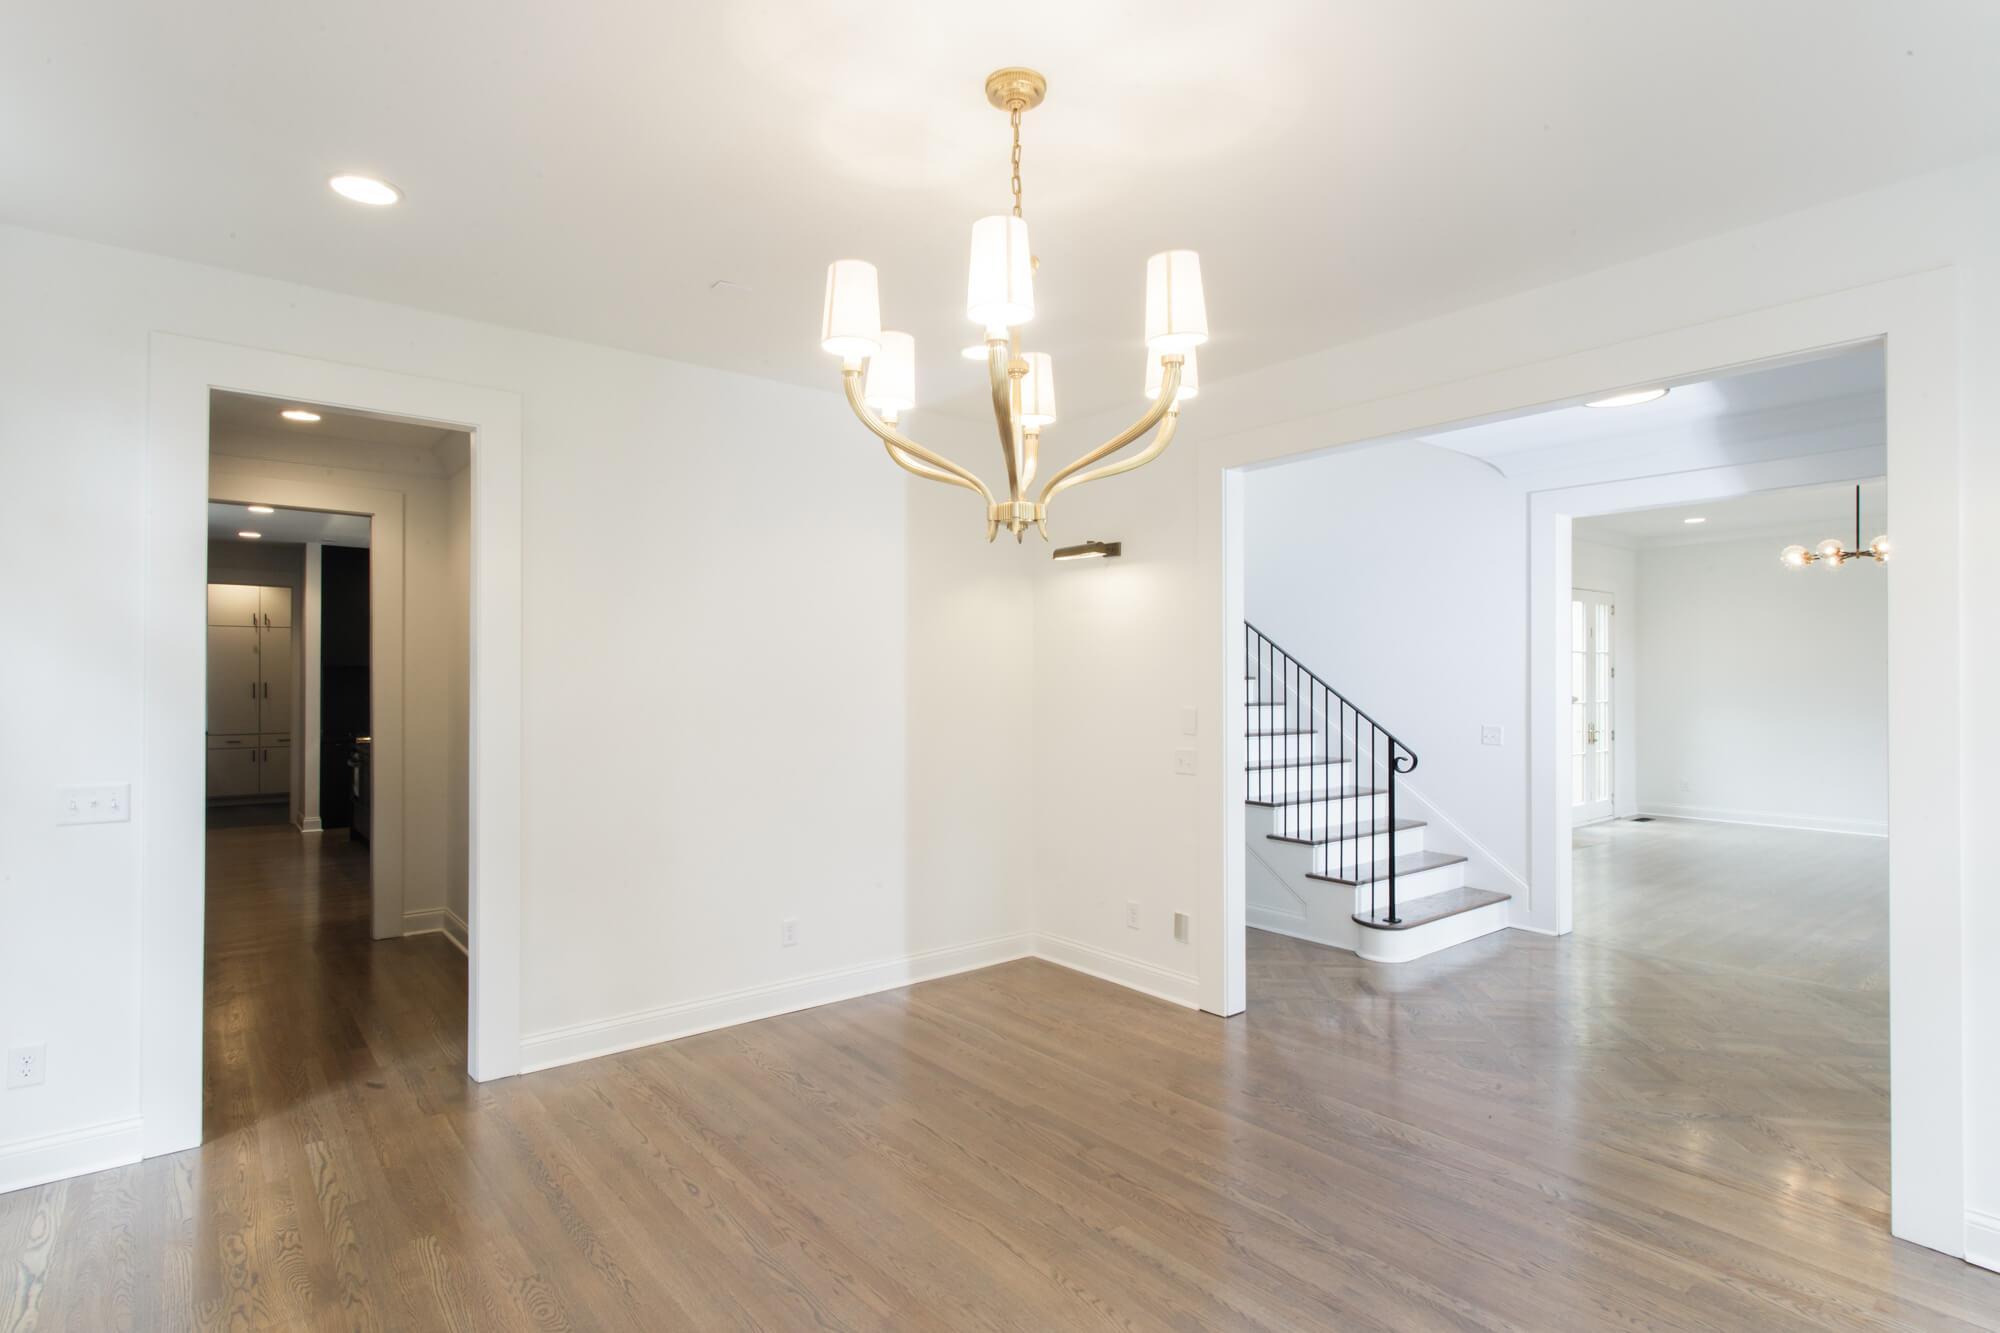 chandelier-development-tennessee-custom-home-builder-5.jpg